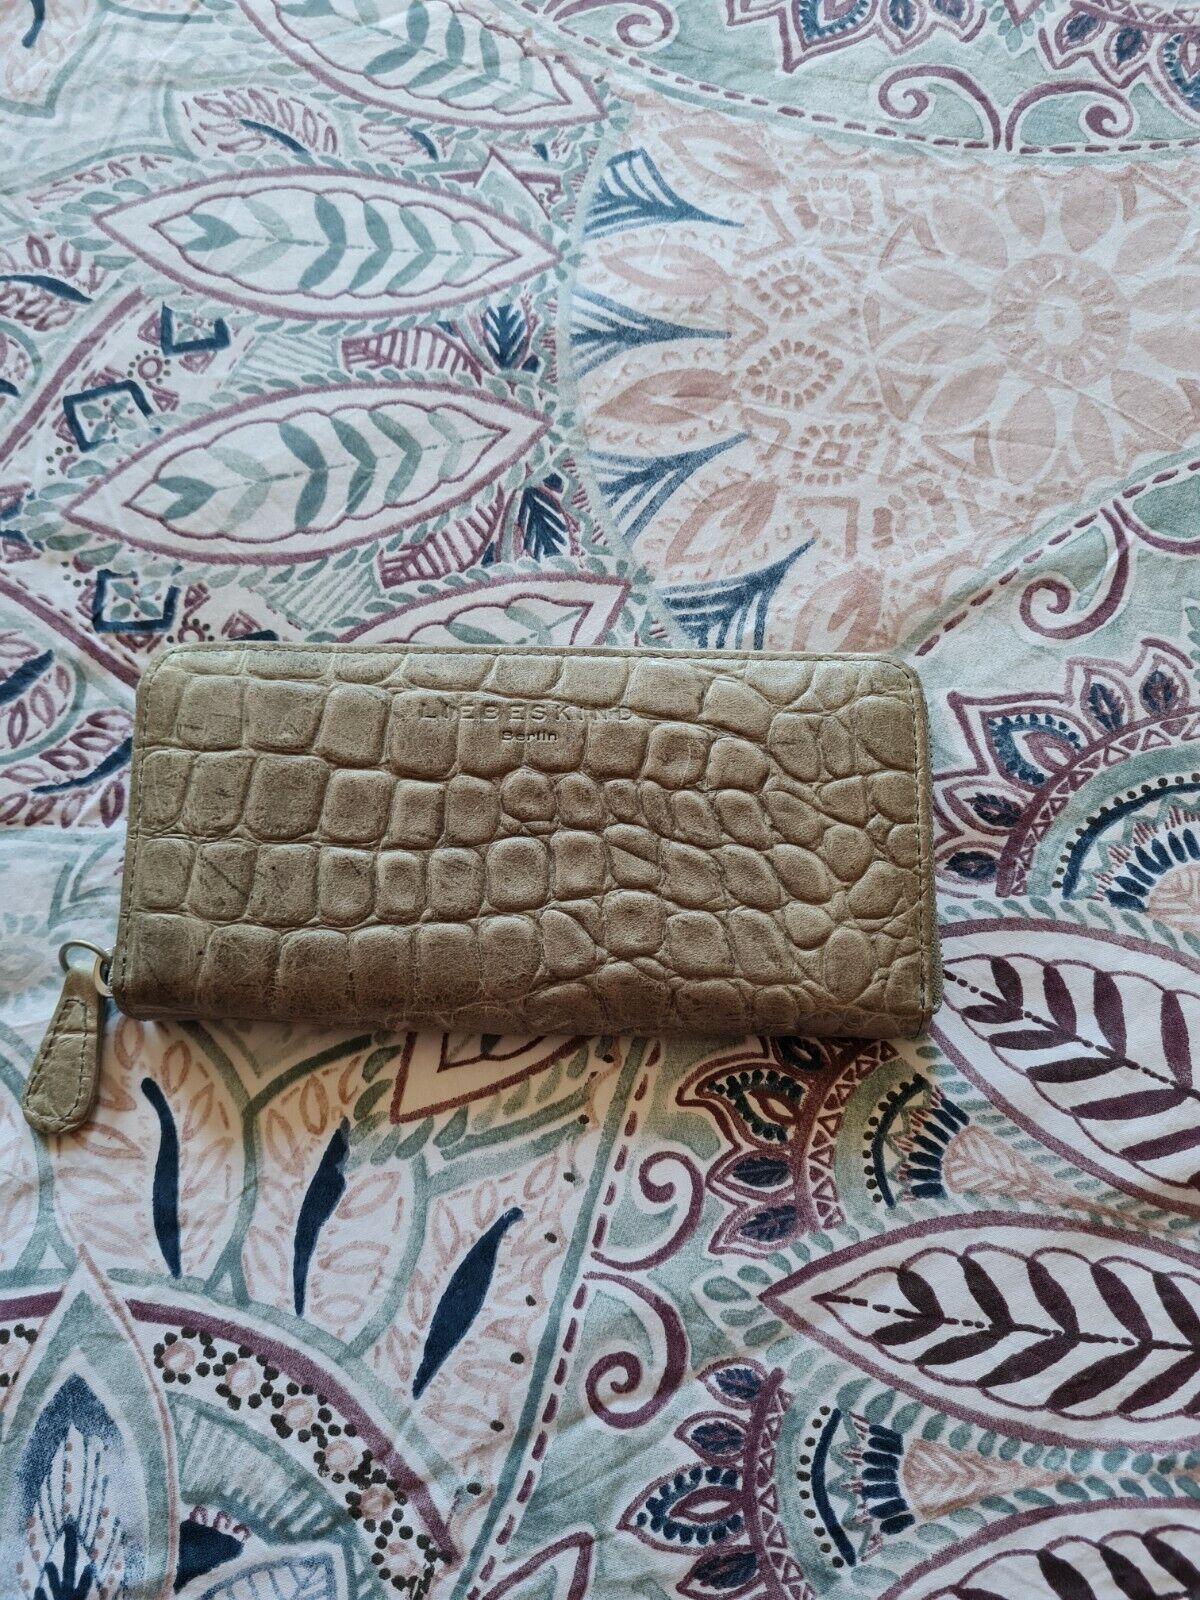 Liebeskind Leather Purse